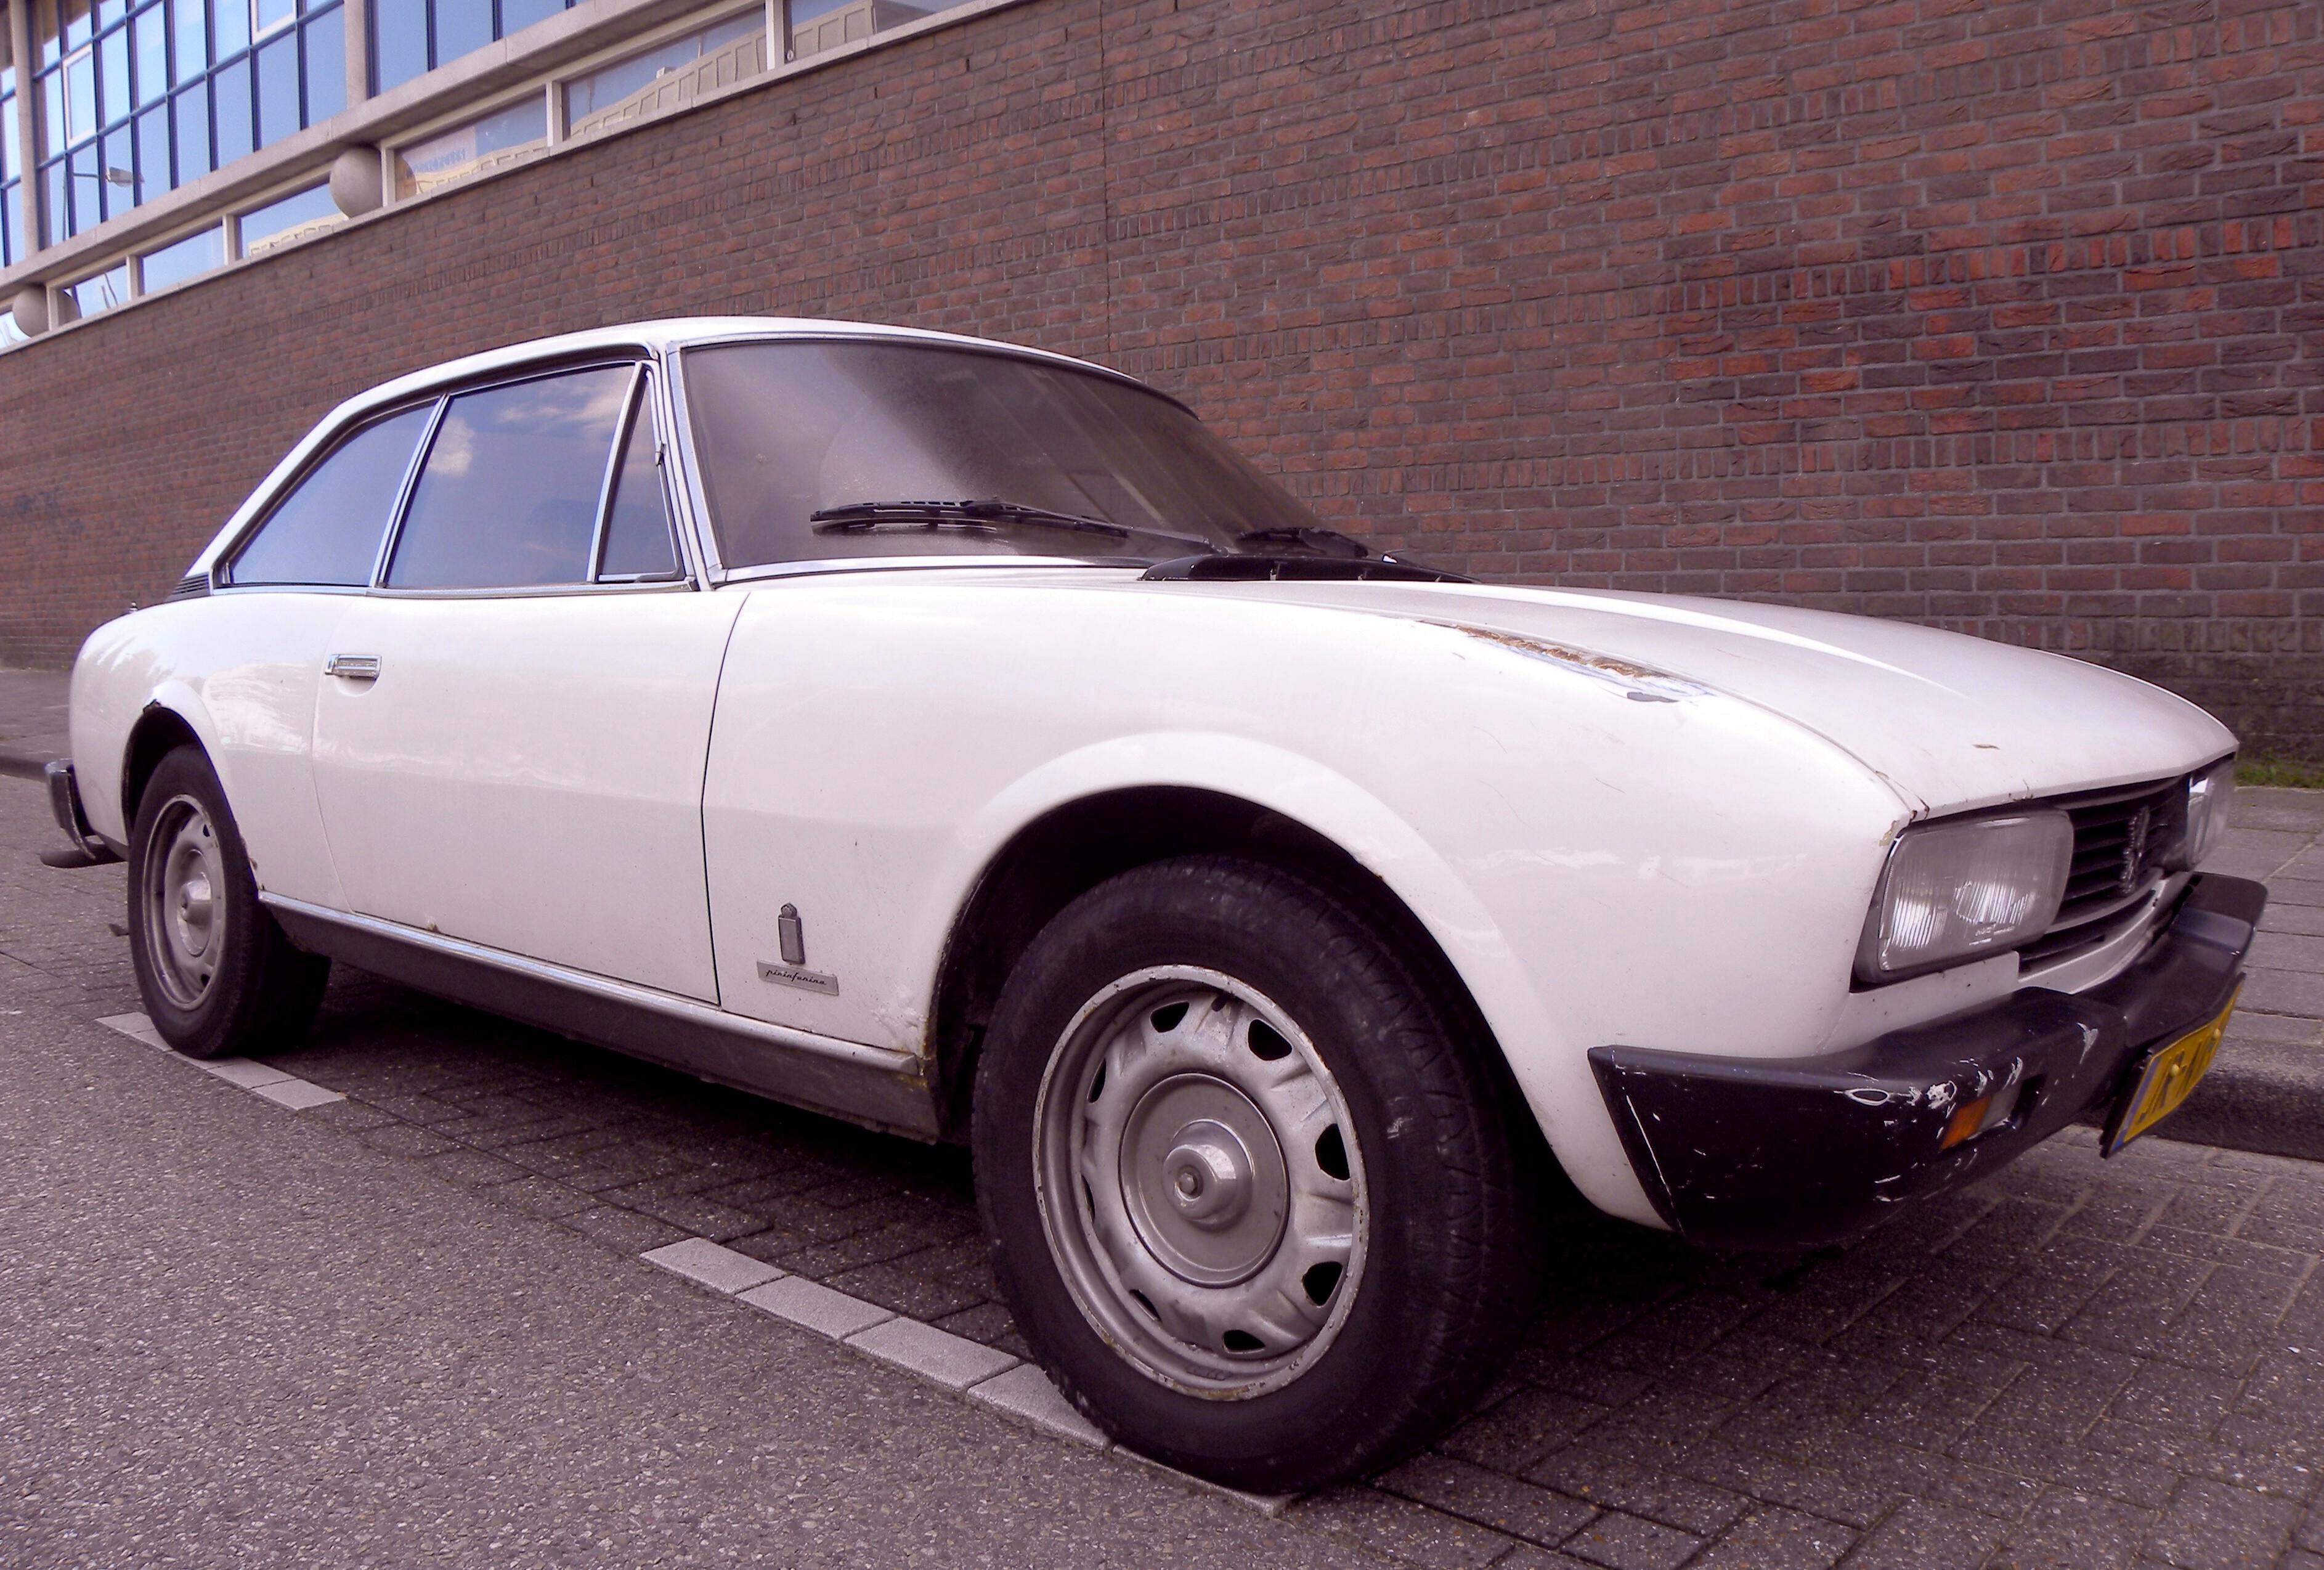 file:peugeot 504 coupé c 32 - wikimedia commons